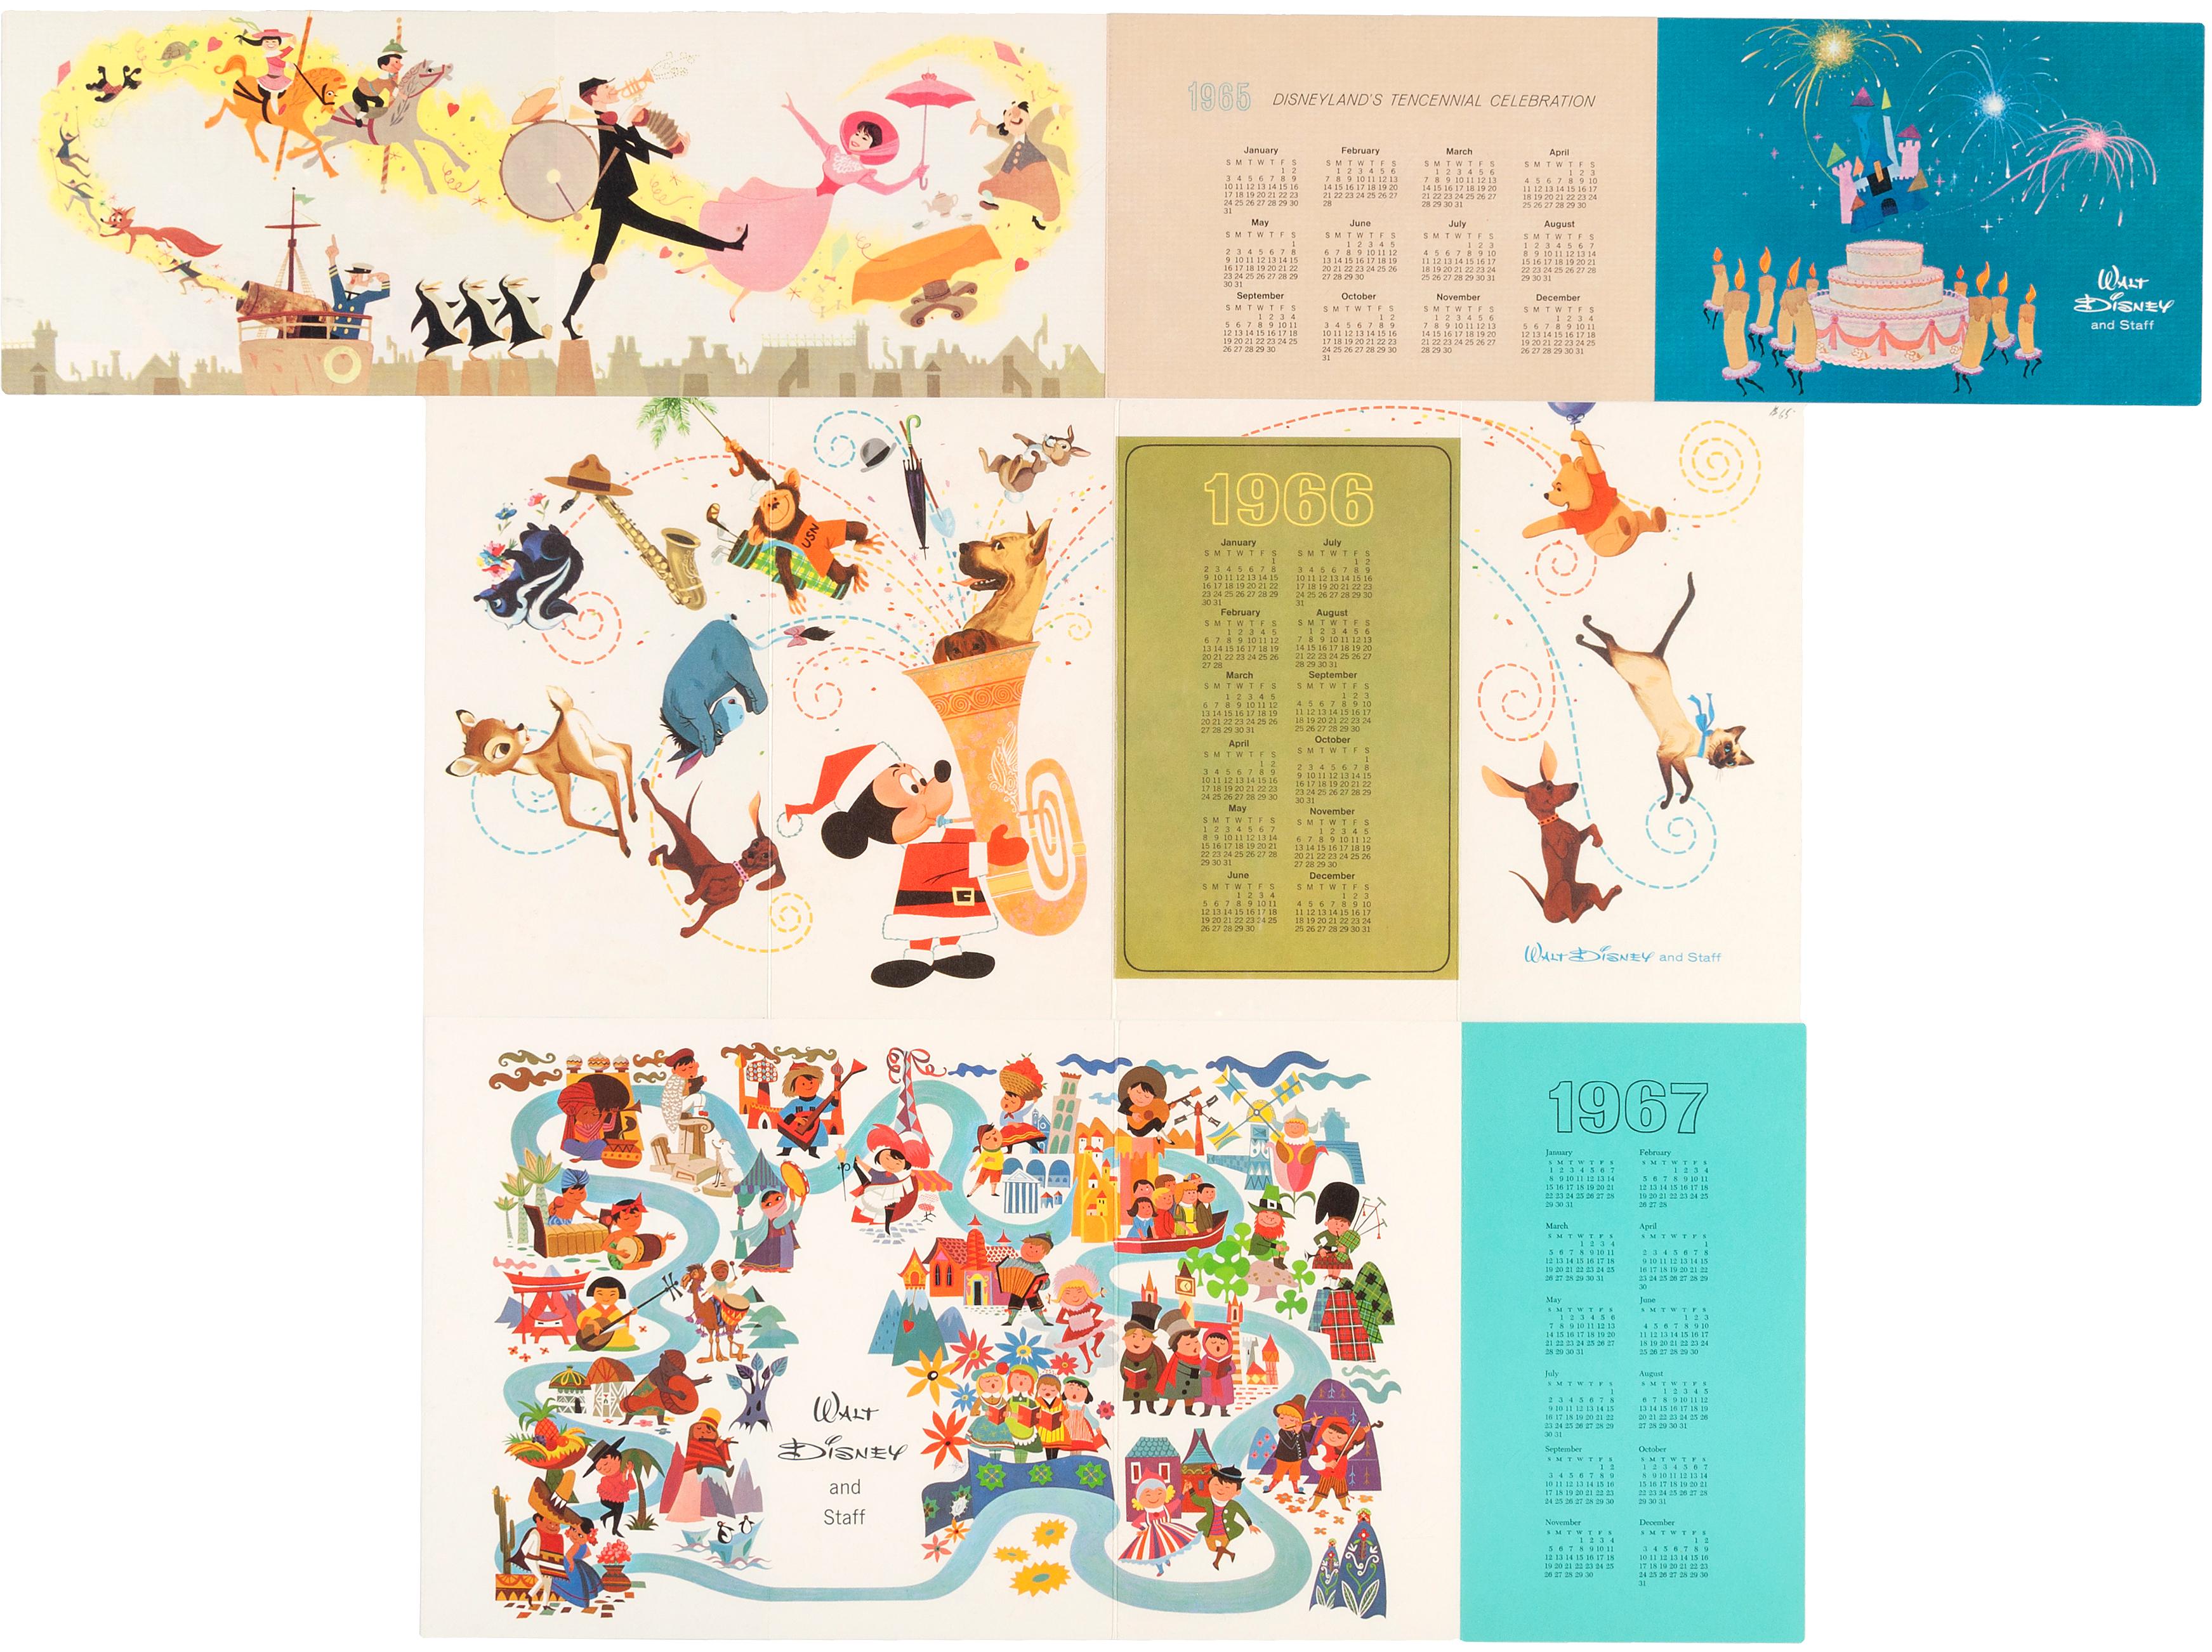 Hake\'s - WALT DISNEY STUDIO CHRISTMAS CARDS FOR 1960-1969.